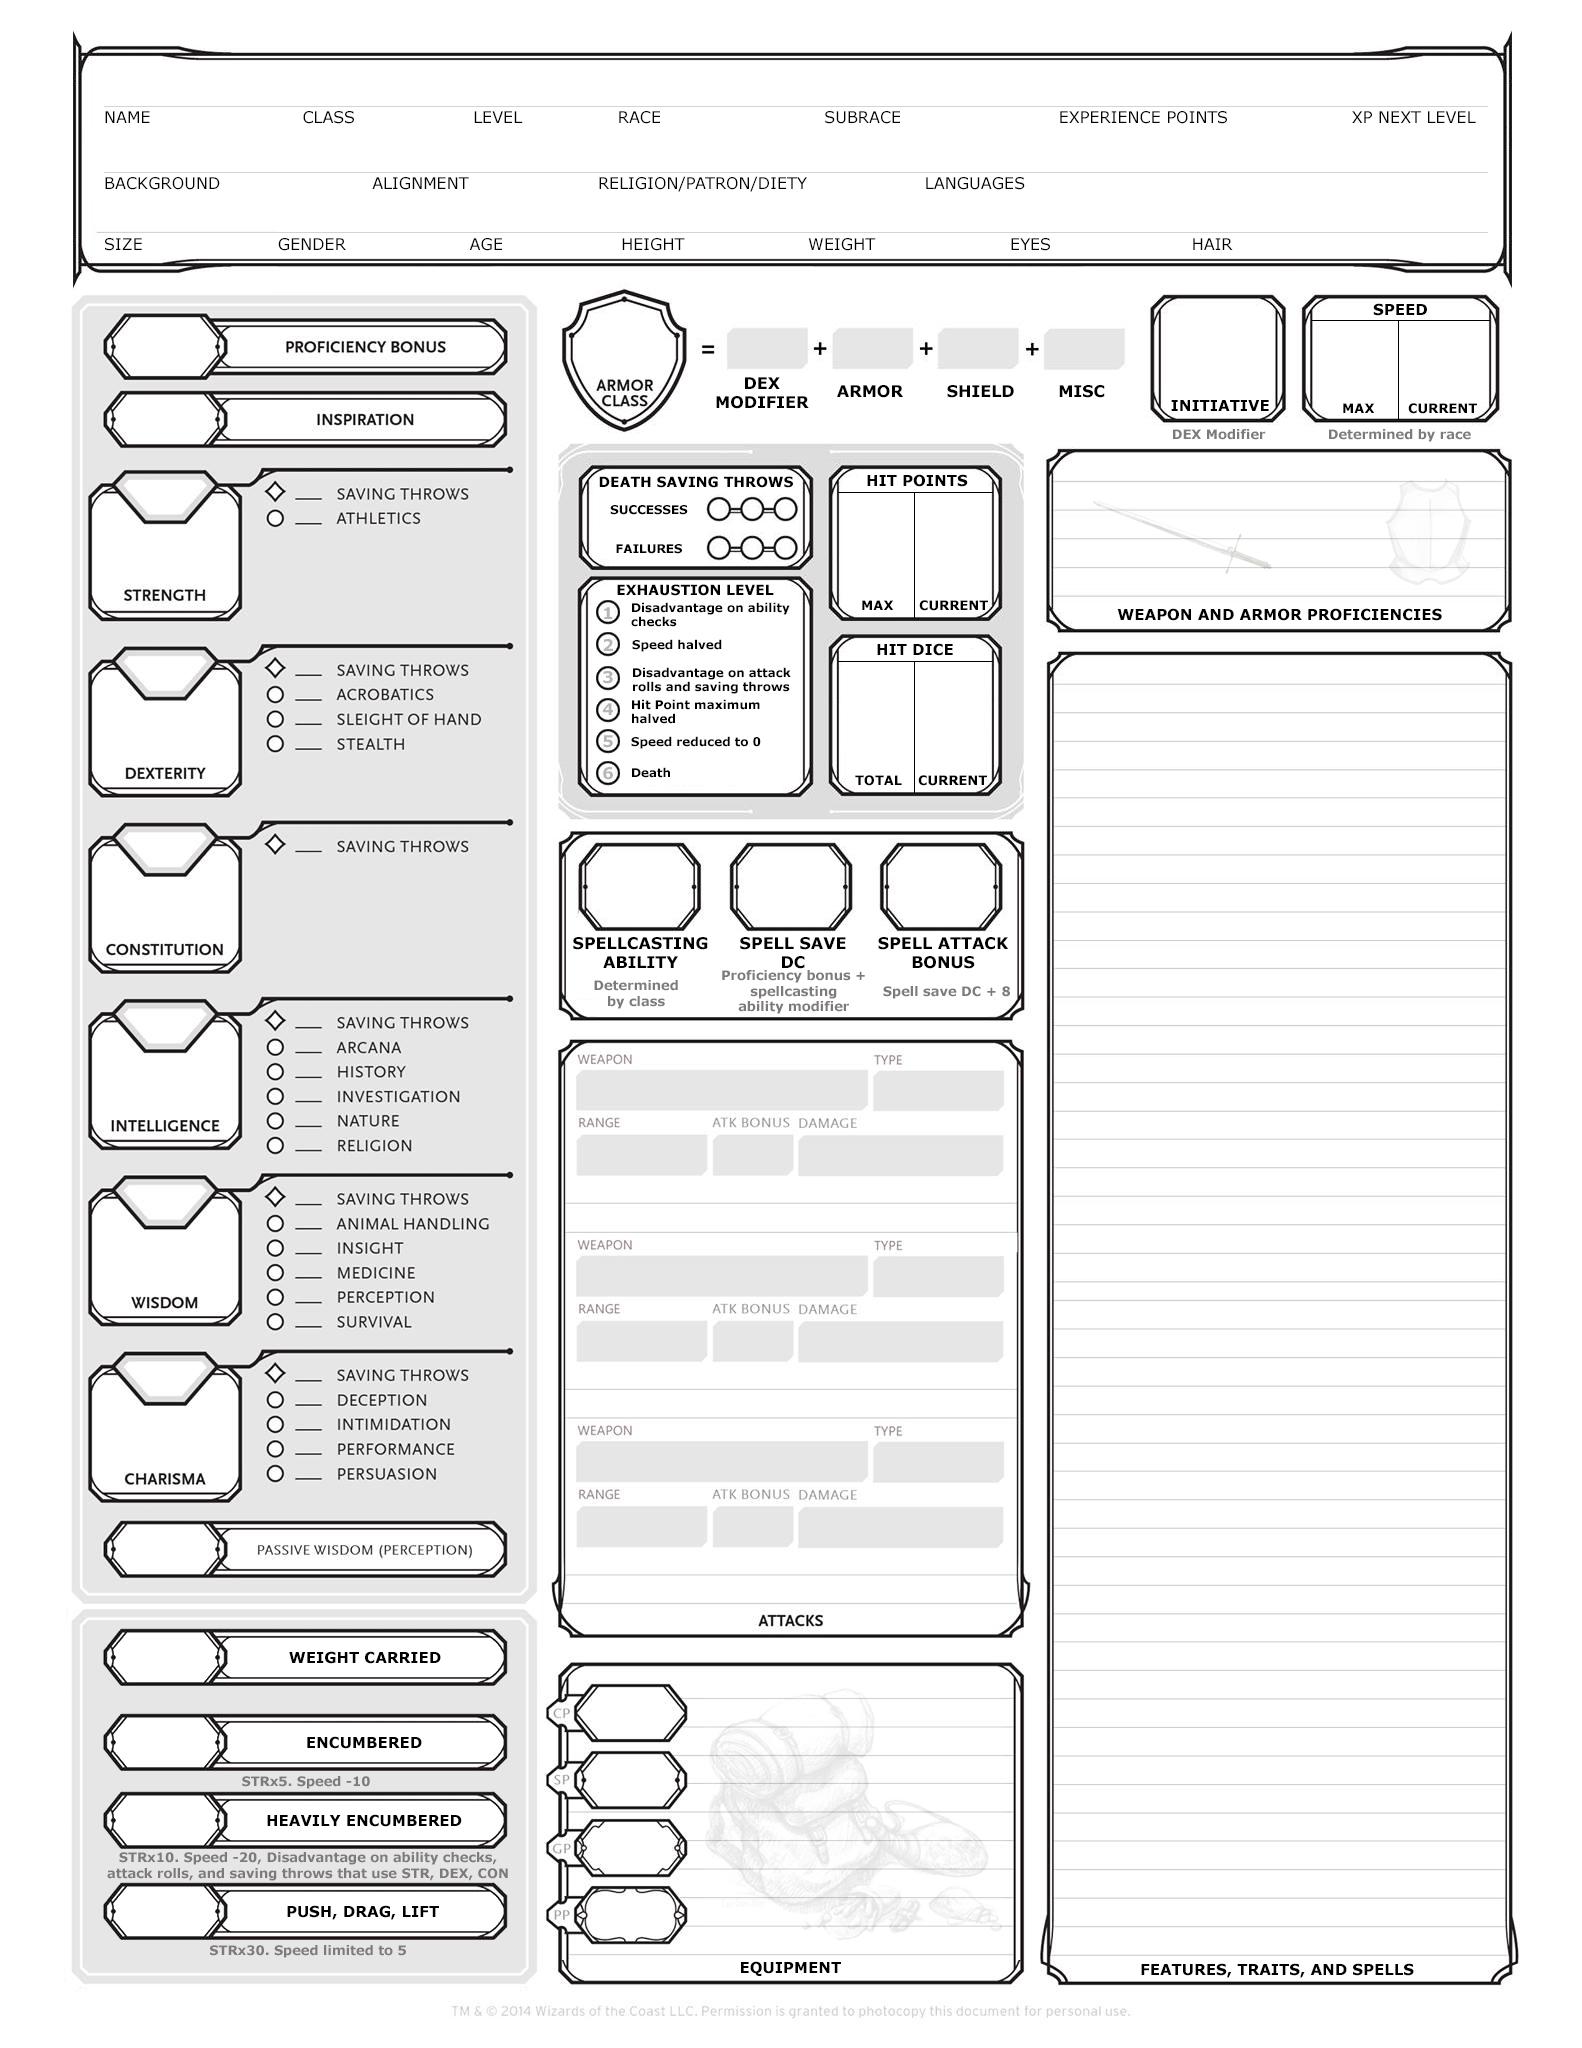 Basic Character Sheet Aimed At New Players Broken Down A